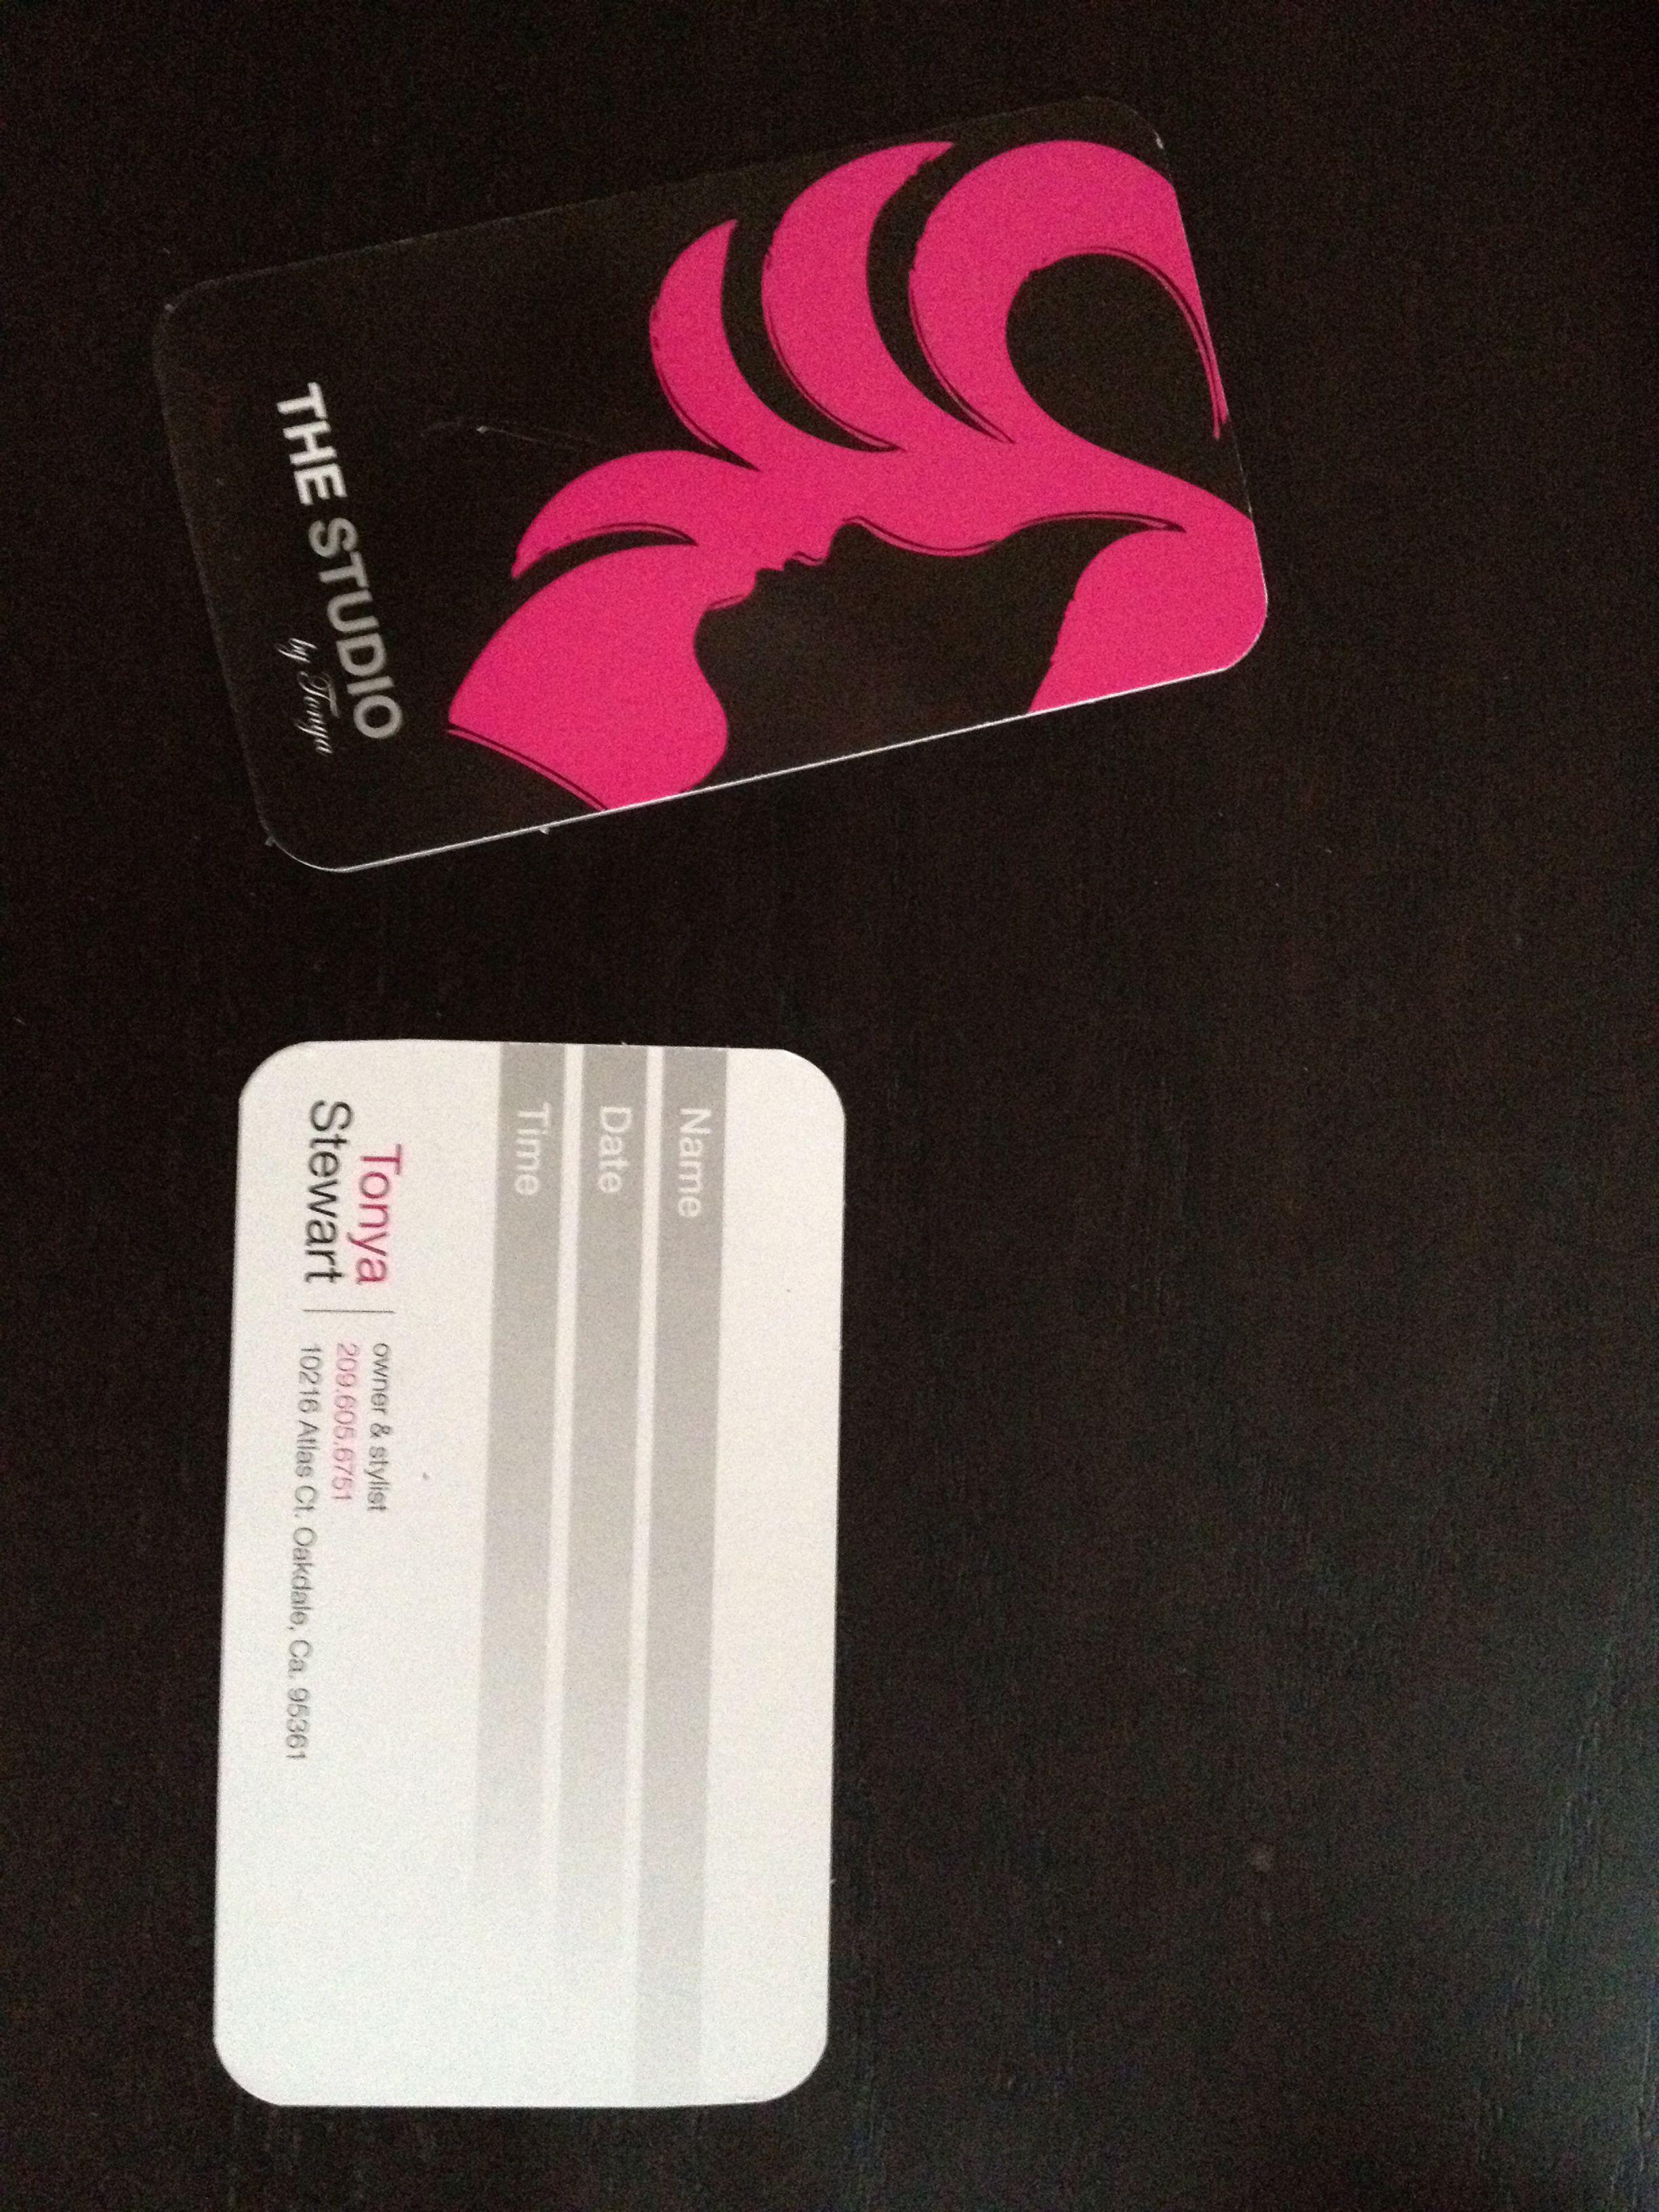 Tonya Stewart hair business cards | Print Products | Pinterest ...